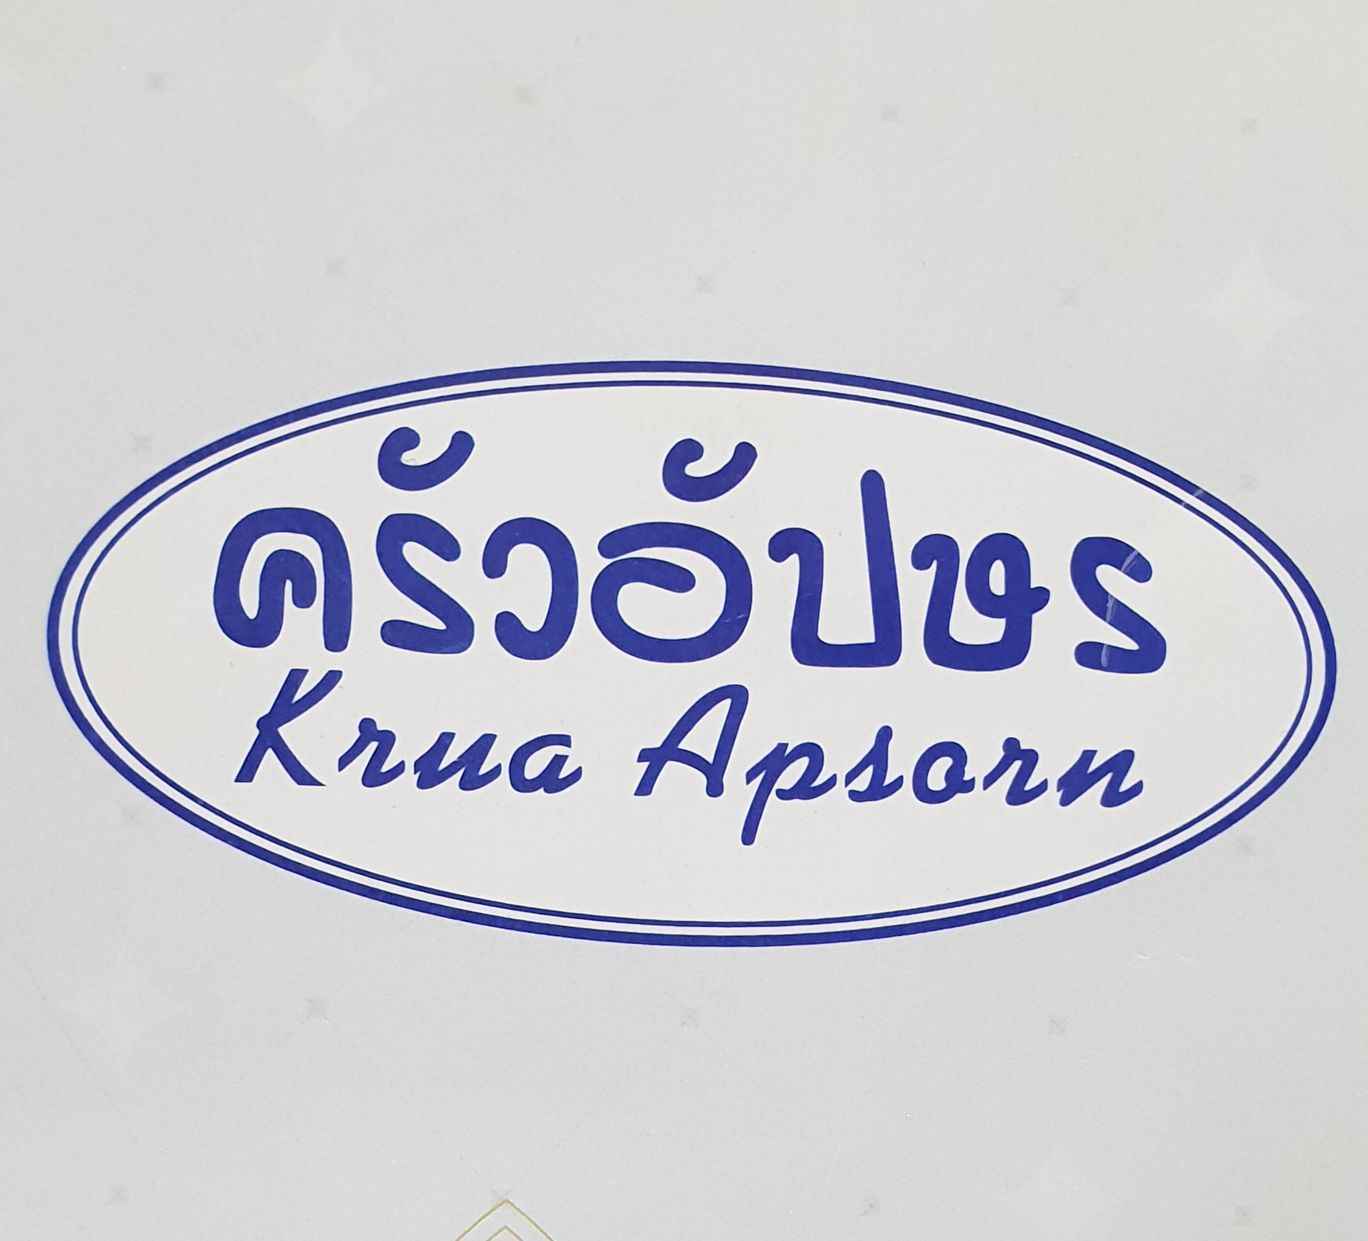 Photo of Krua Apsorn By Karthik Gandhi aka GastroHogger